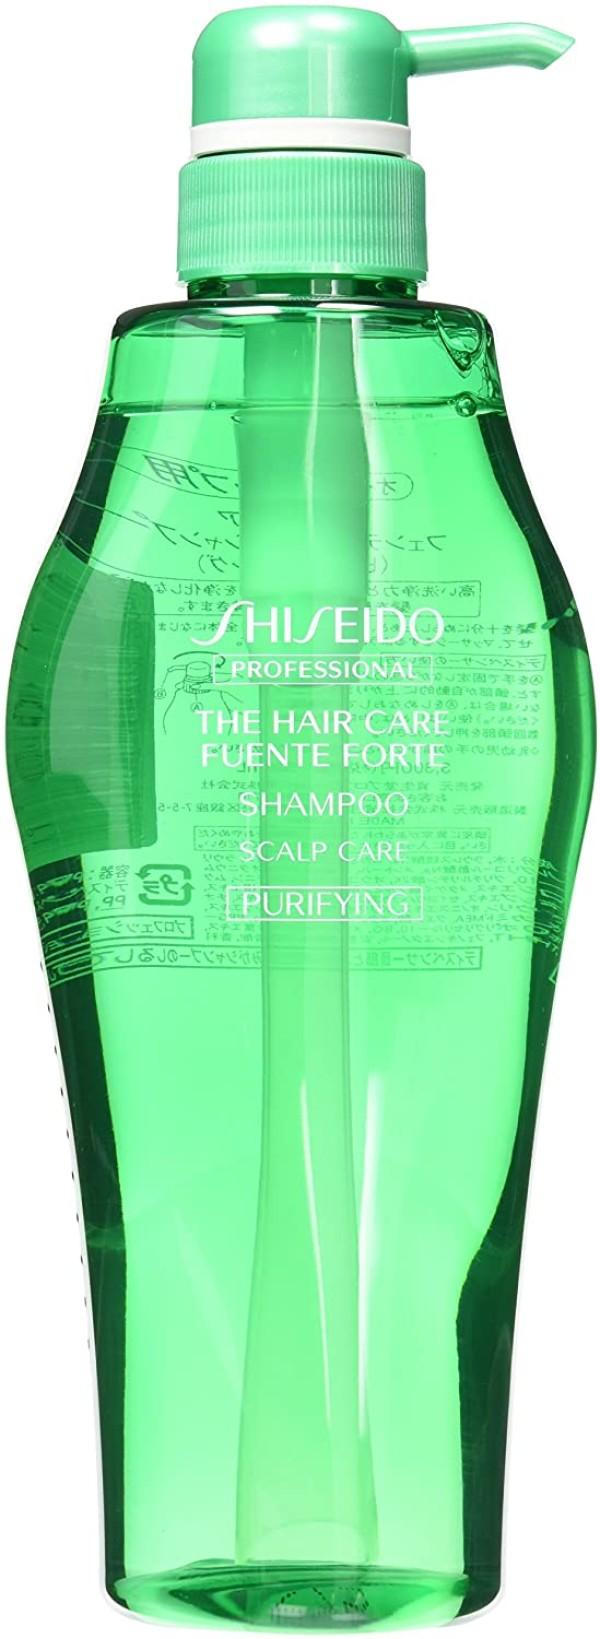 Очищающий шампунь Shiseido Professional Fuente Forte Shampoo Purifying